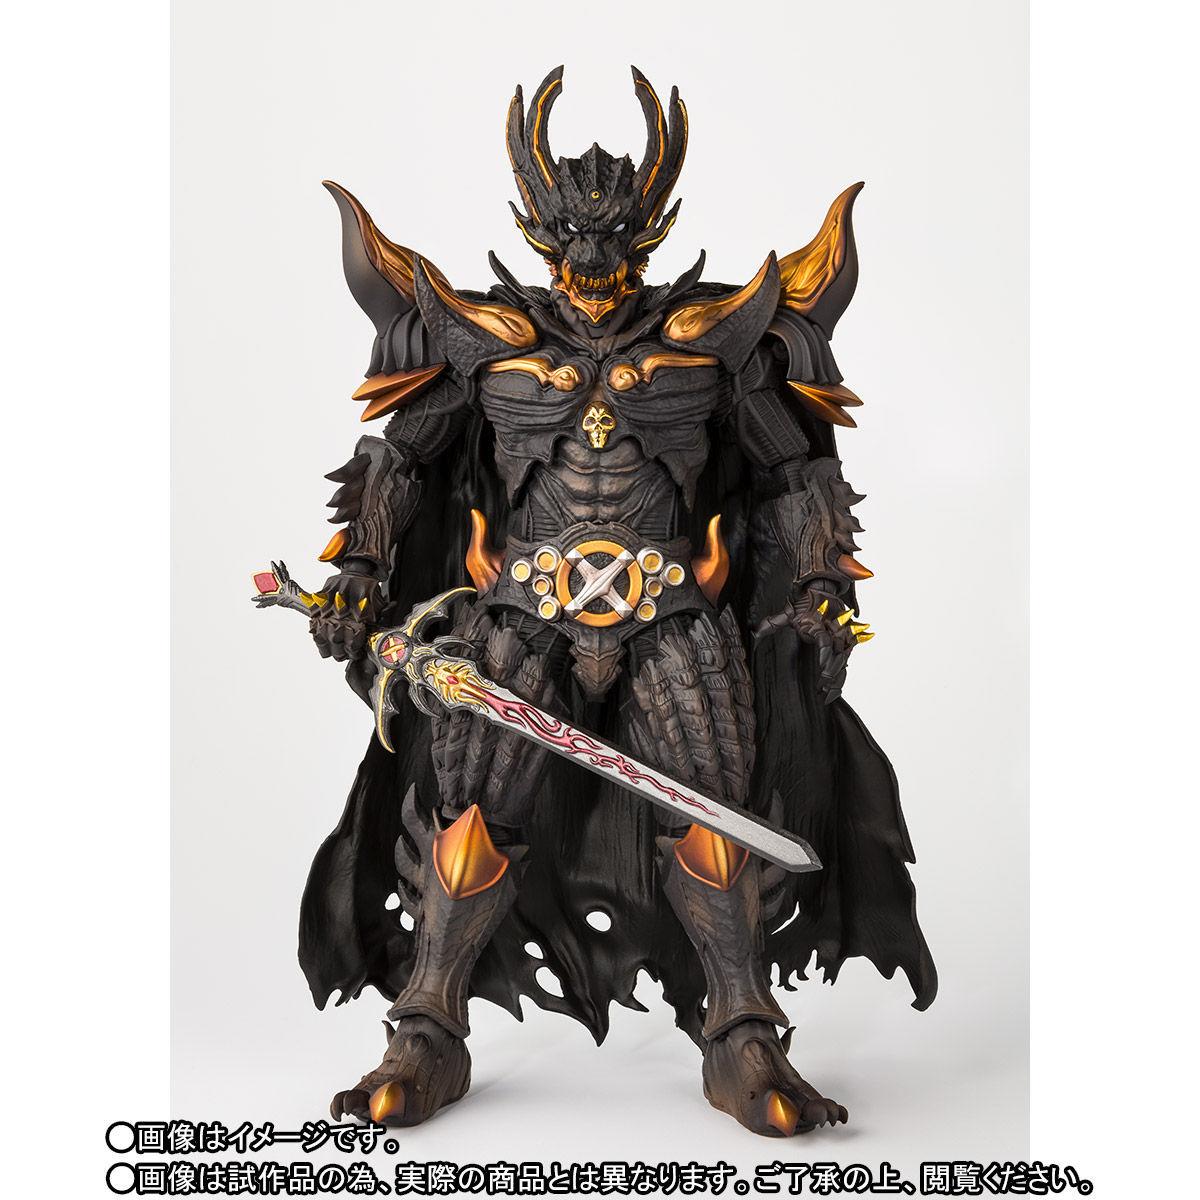 Figuarts(真骨彫製法) 暗黒騎士キバ予約6